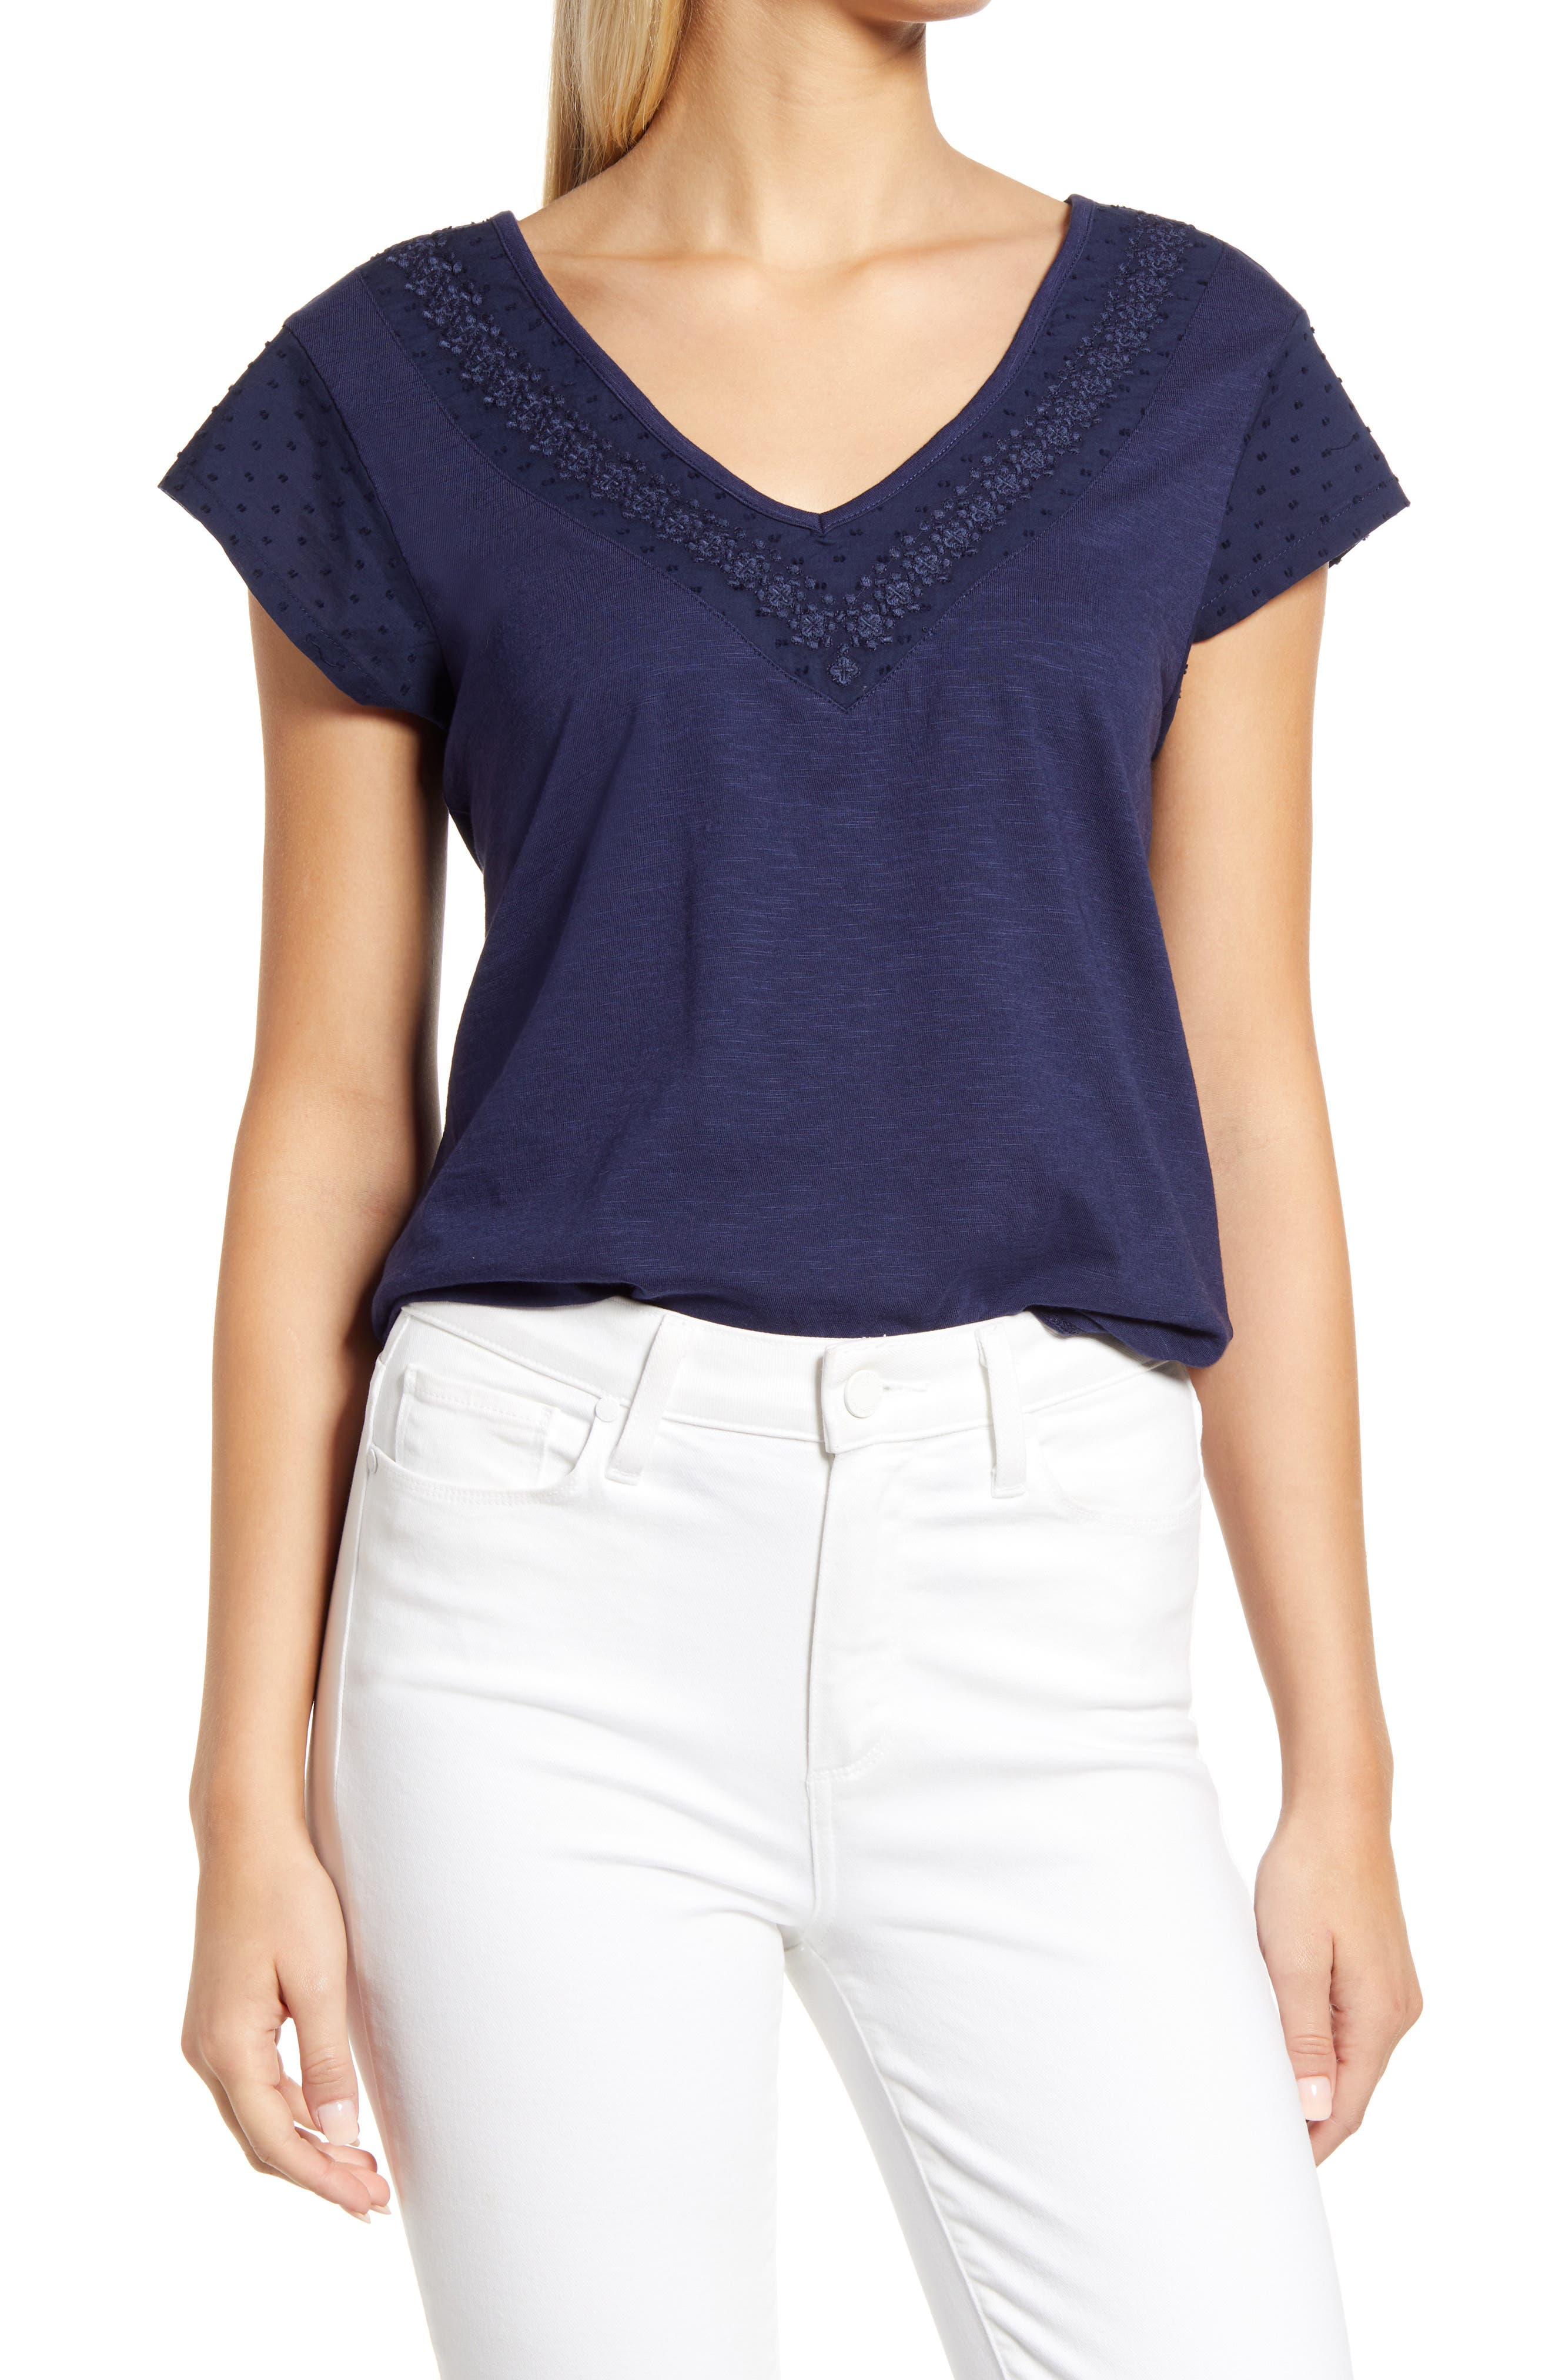 Women's Caslon Embroidered Neck Short Sleeve Cotton Blend Top